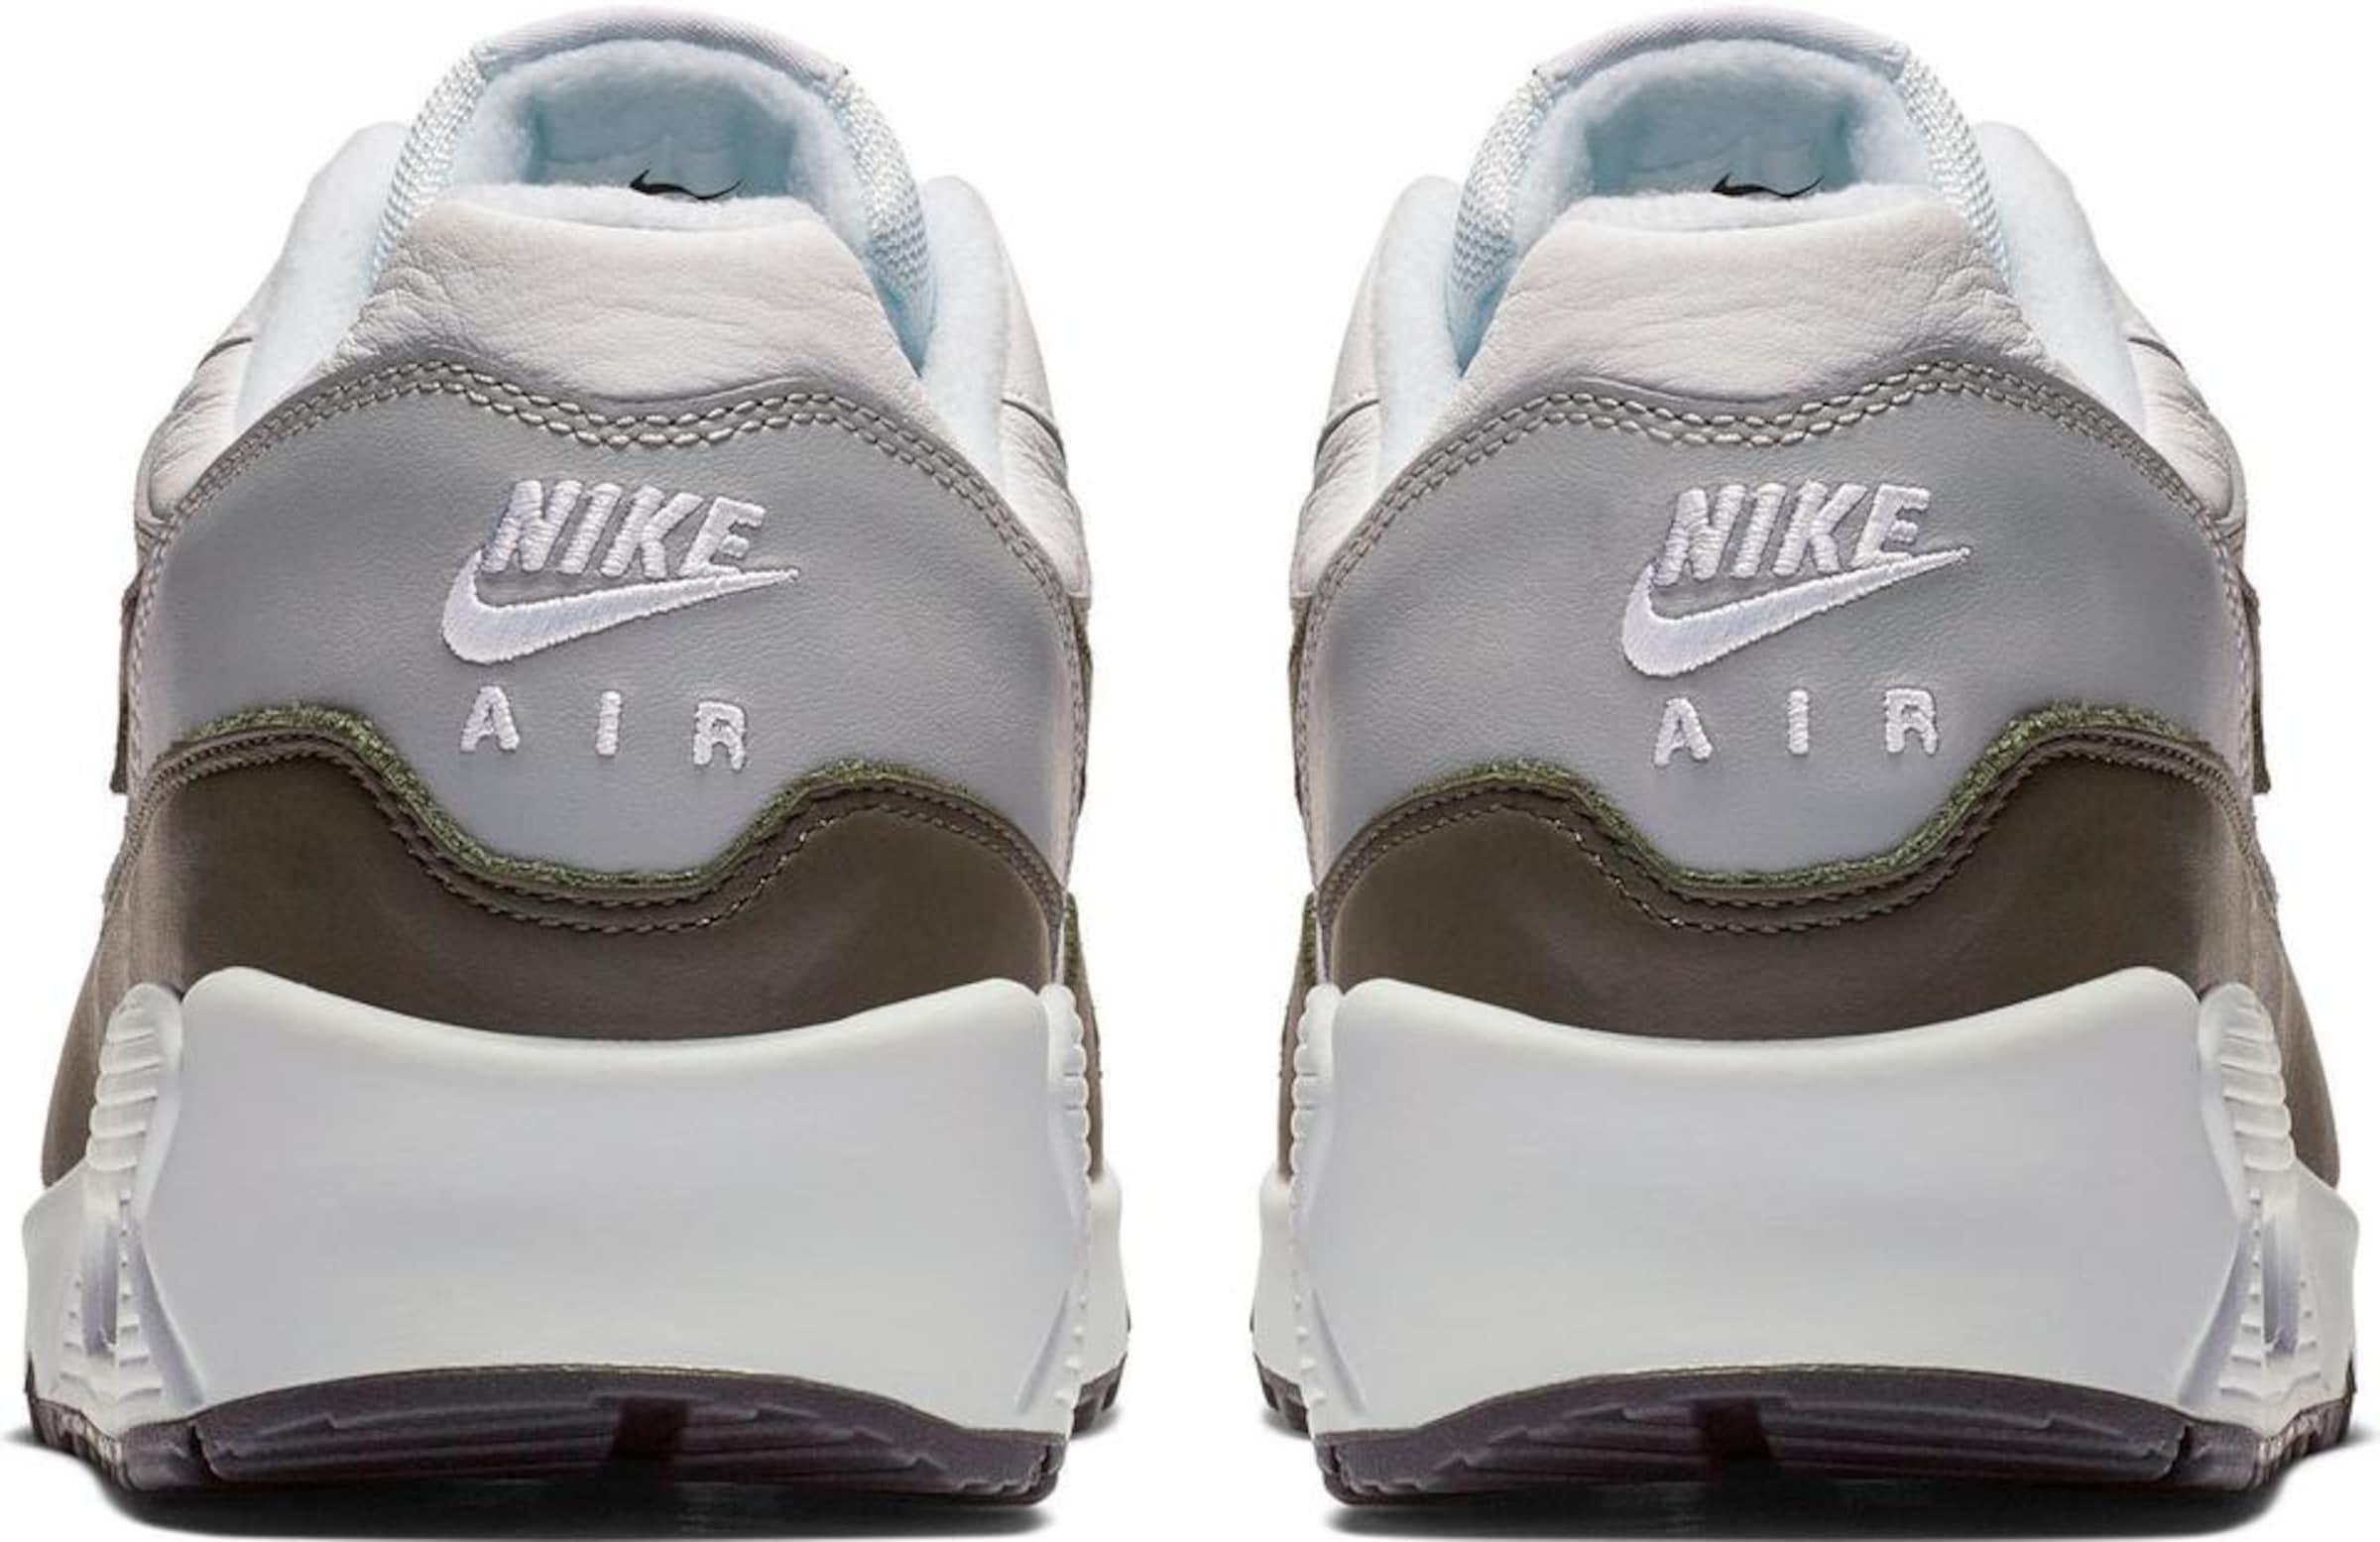 Sneaker In Sportswear 'air Weiß GrauSchwarz 90 Nike Max 1' OXkPZiu